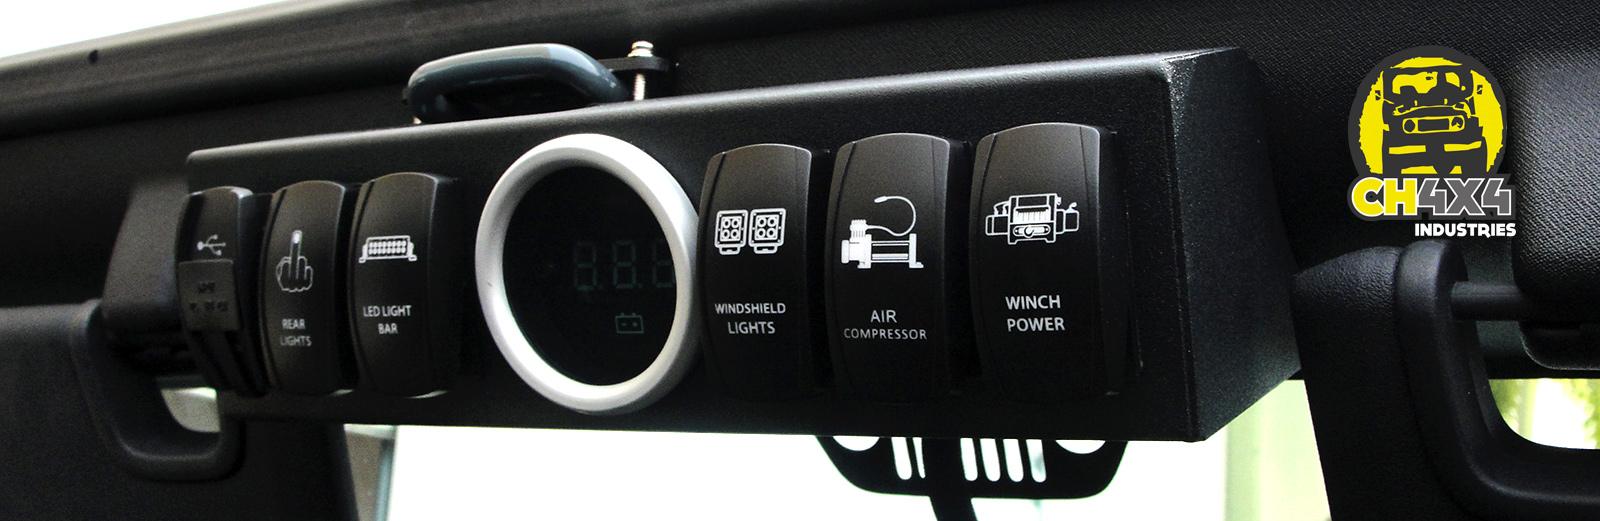 Jeep Jk Switch Panel Wrangler Dash Switches Ch4x4 Rocker Bracket With Digital Voltmeter For 2007 2015